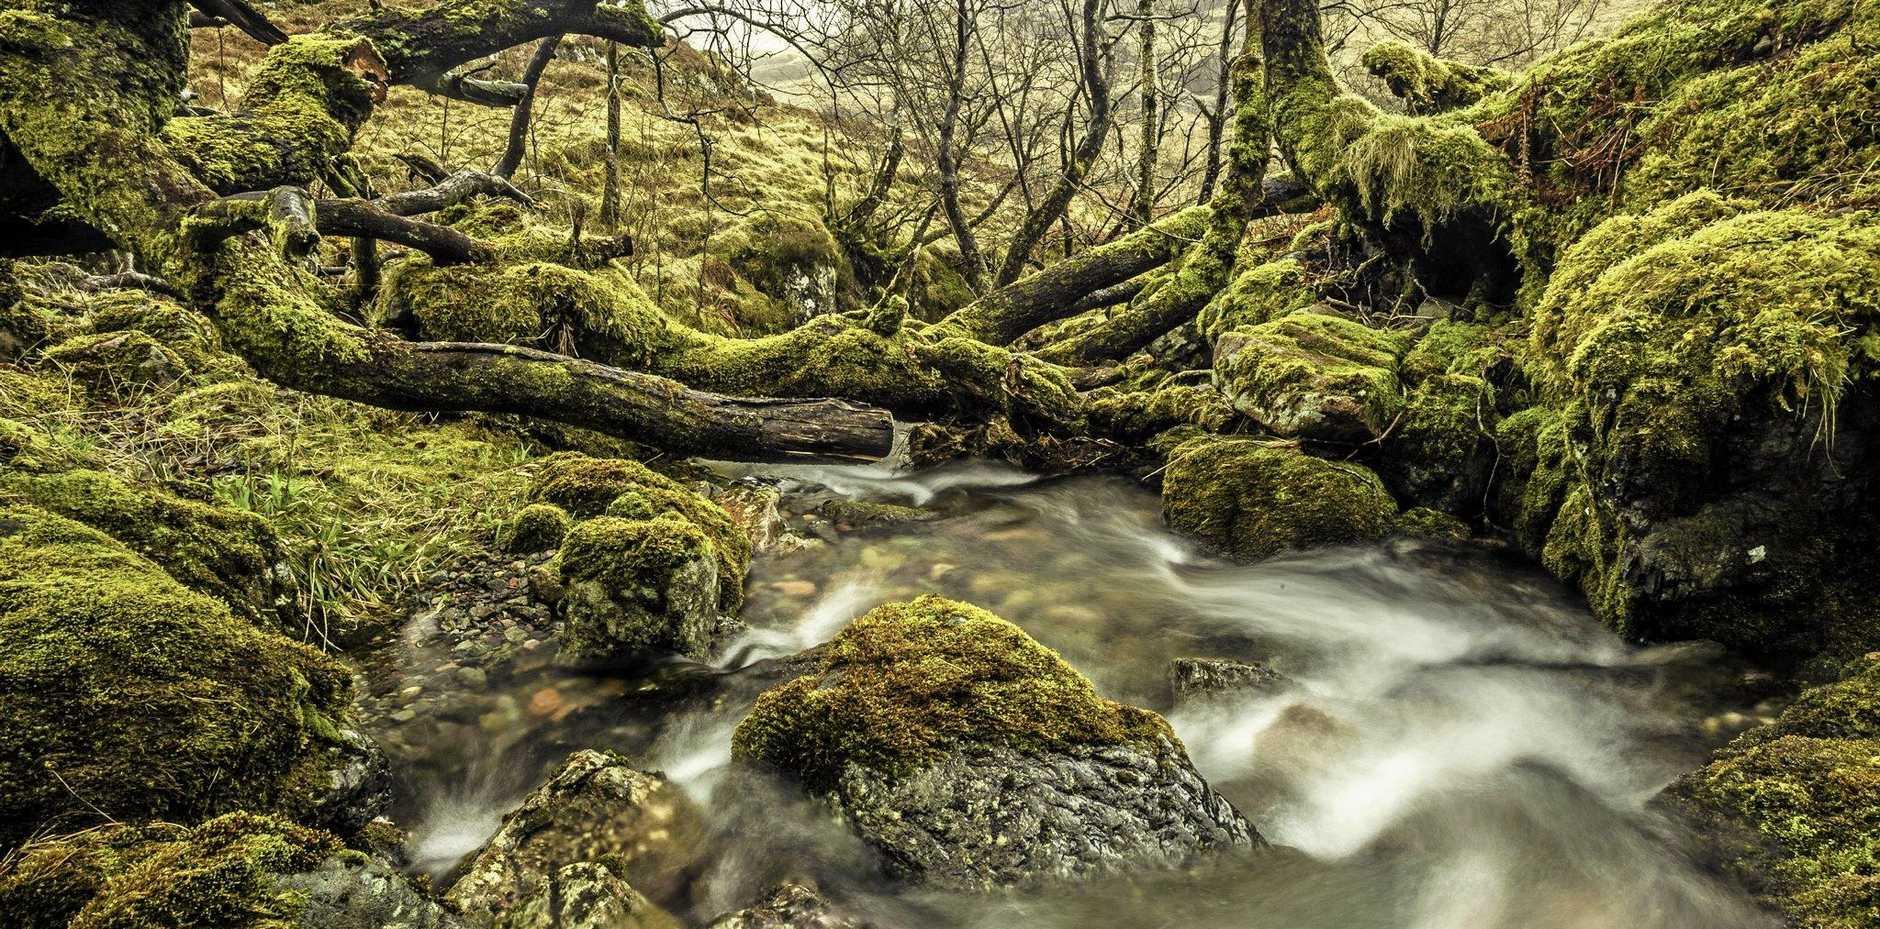 ABOVE: Picturesque Glencoe